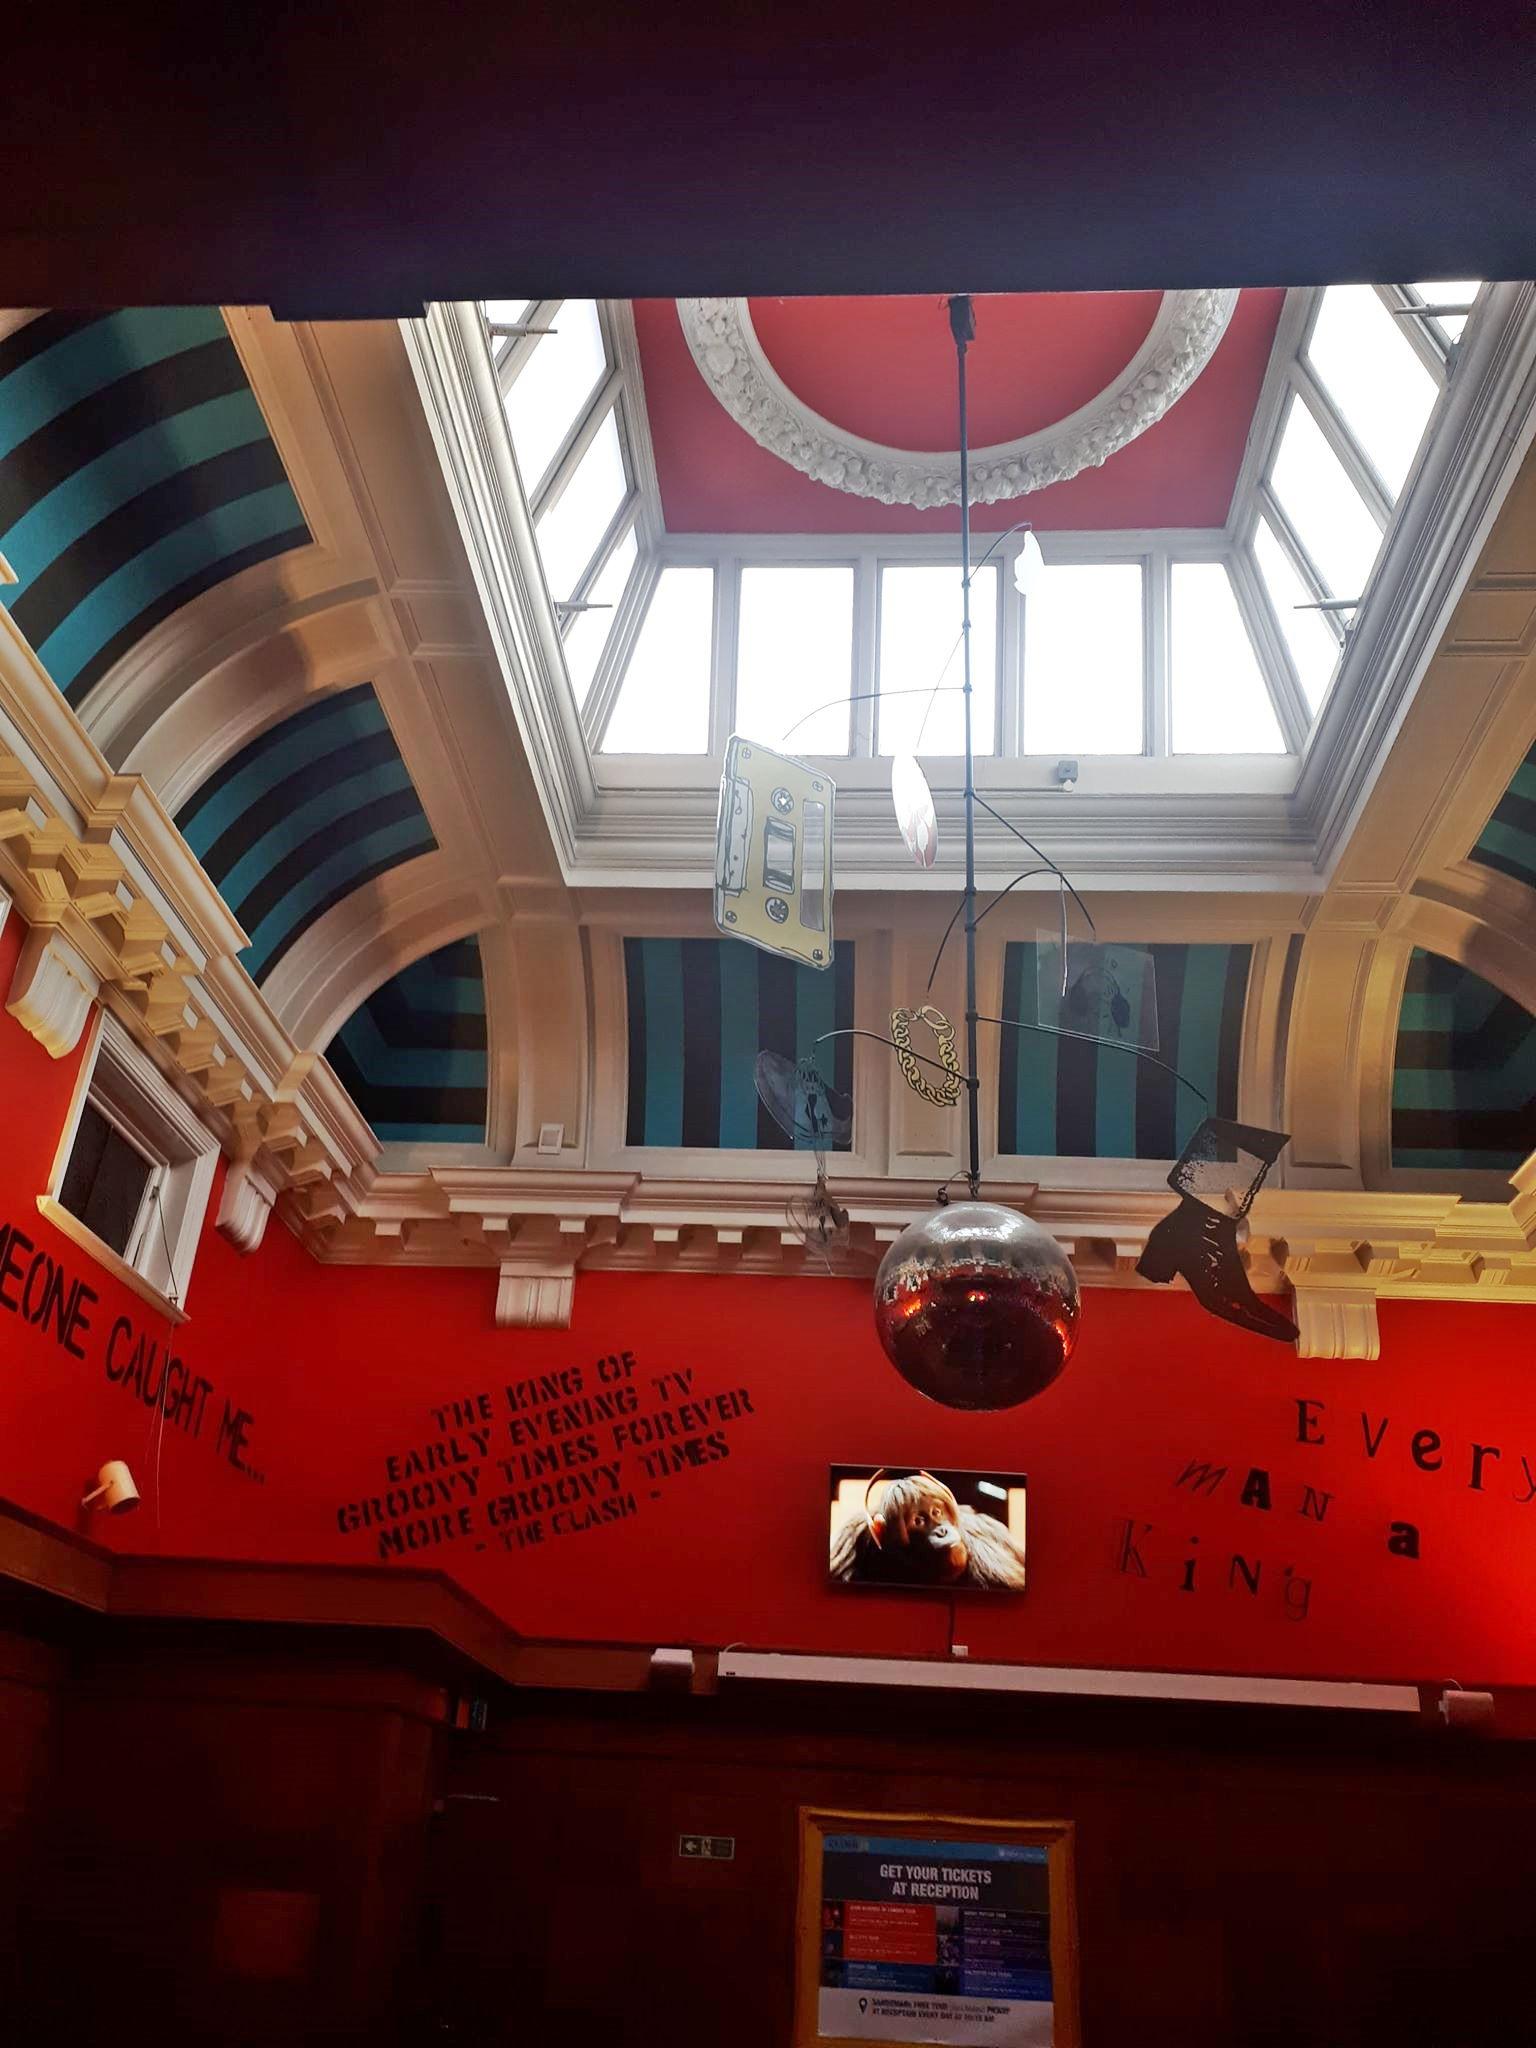 london hostel courtroom 2